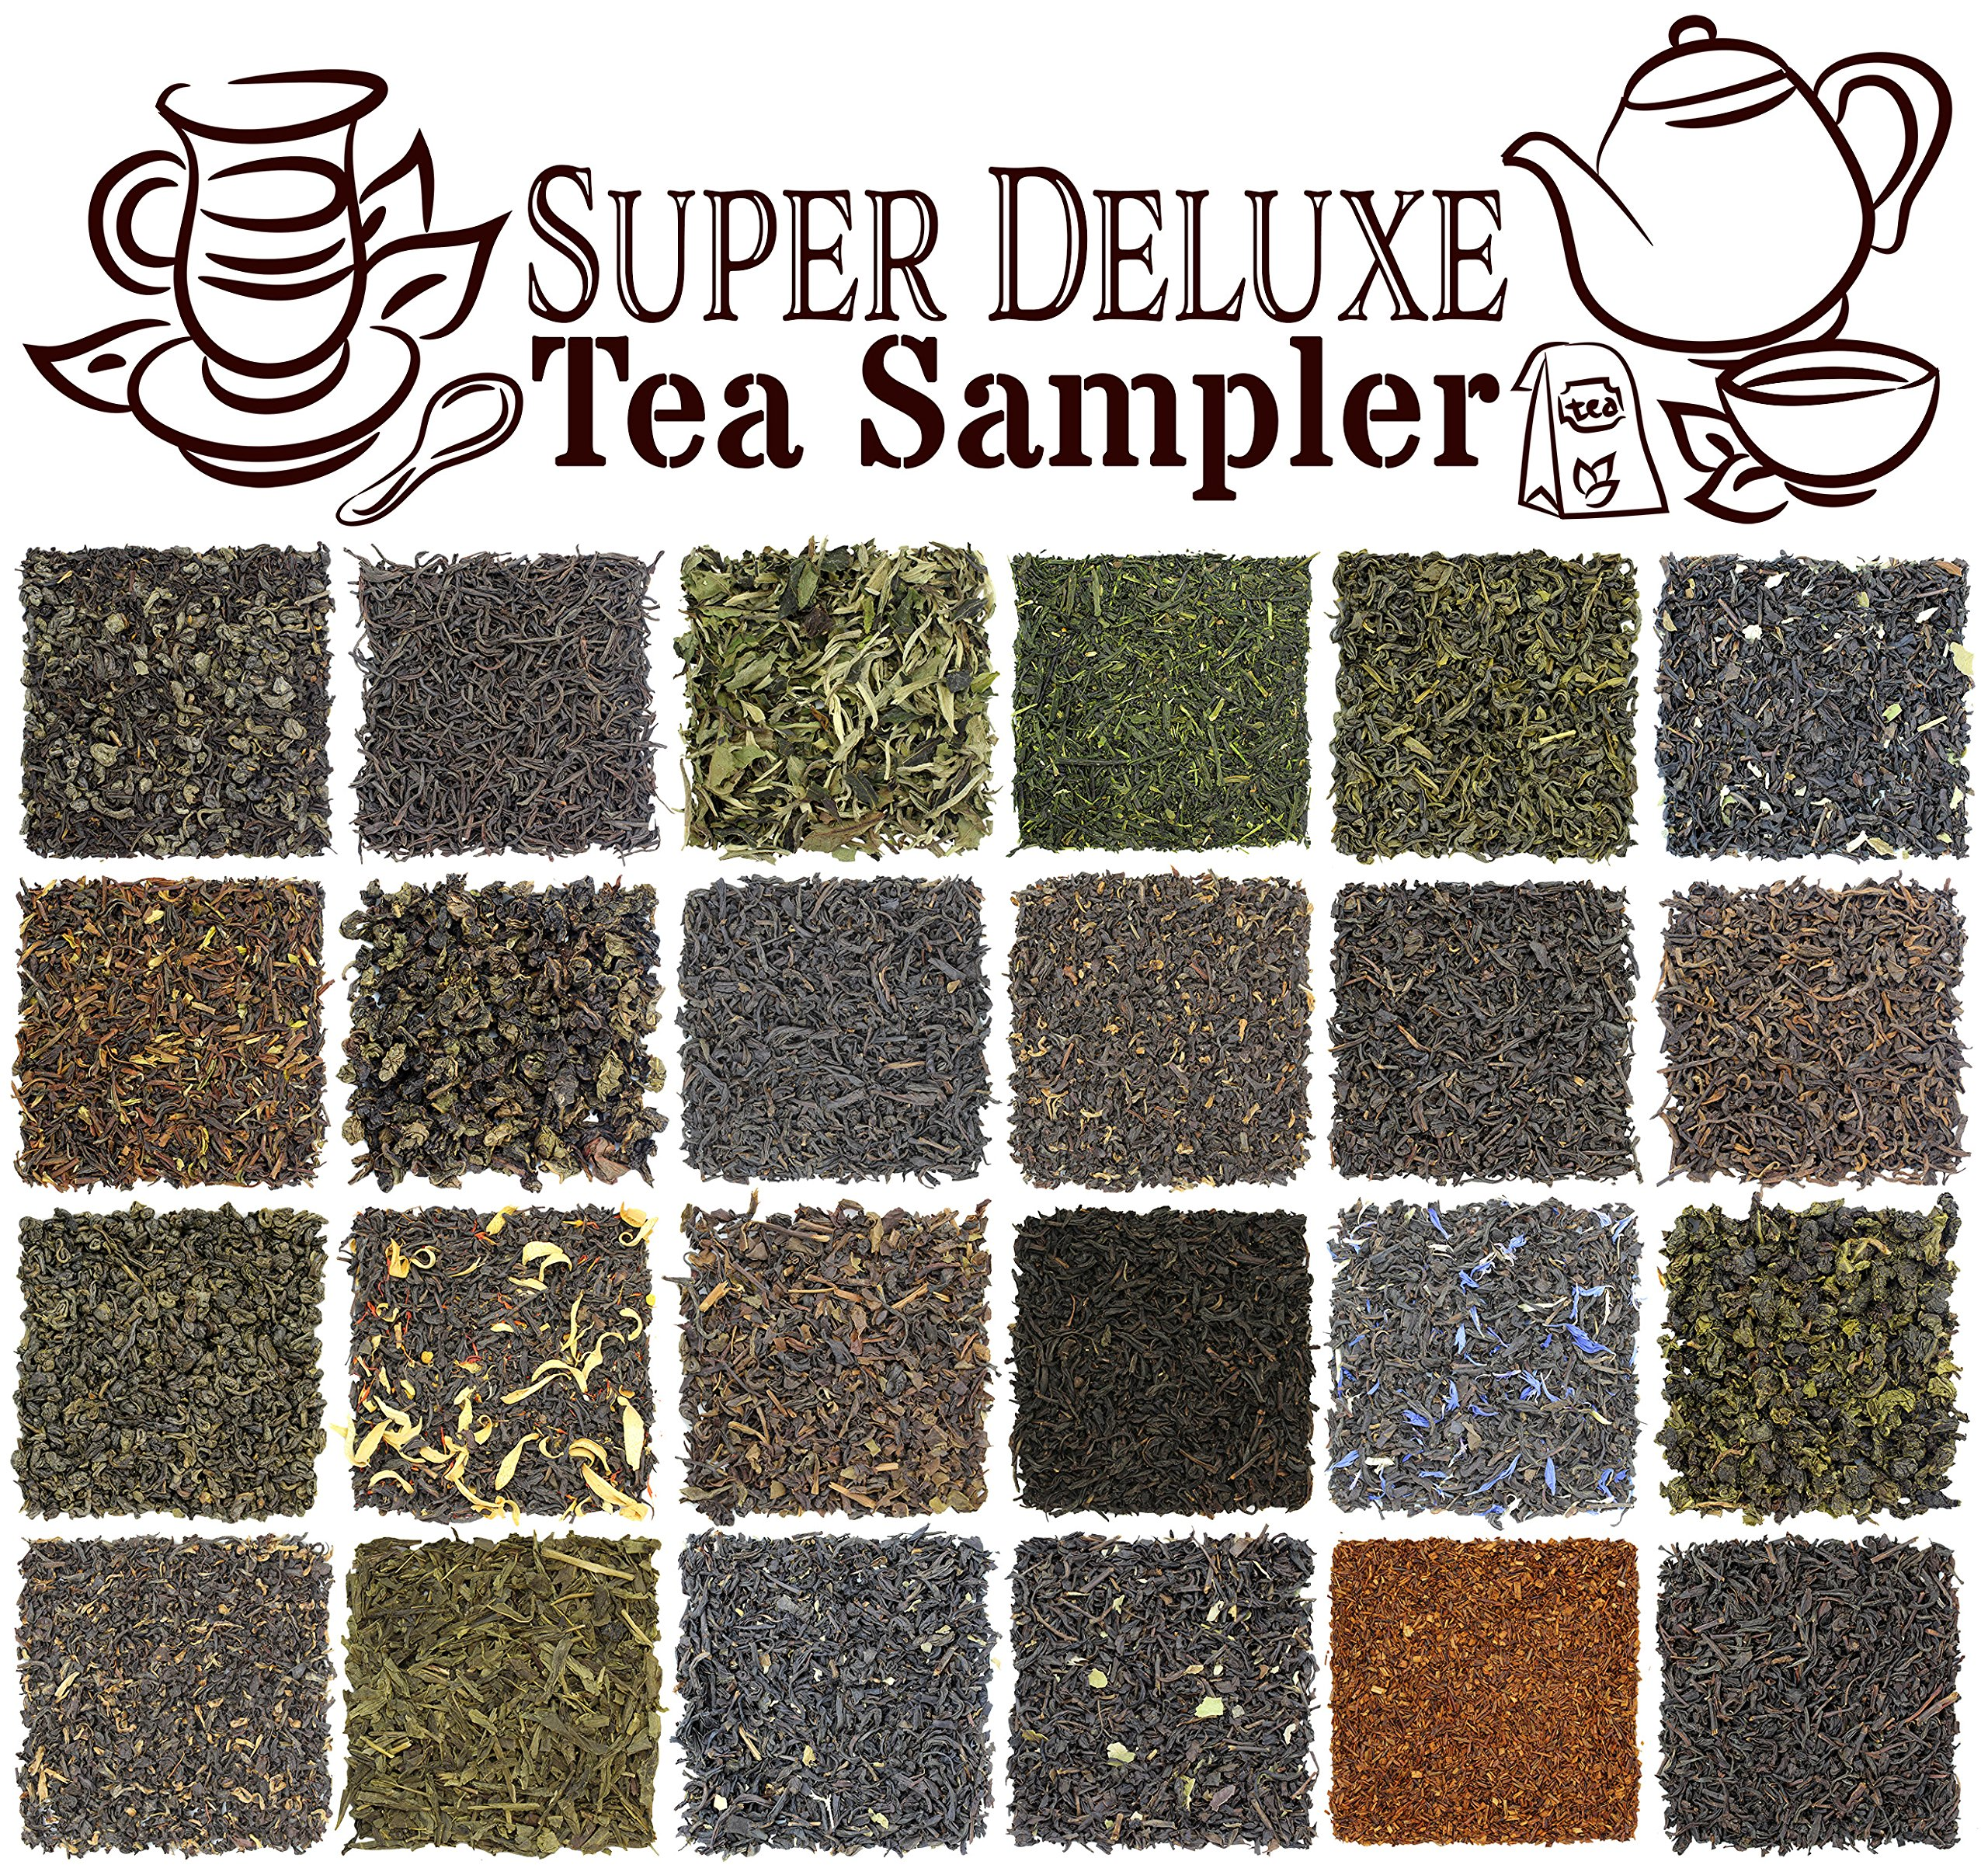 24-Variety Super Deluxe Loose Leaf Tea Sampler Gift Set w/Green, Black, Oolong, White, Herbal, Pu'er and Flavored Gourmet Teas